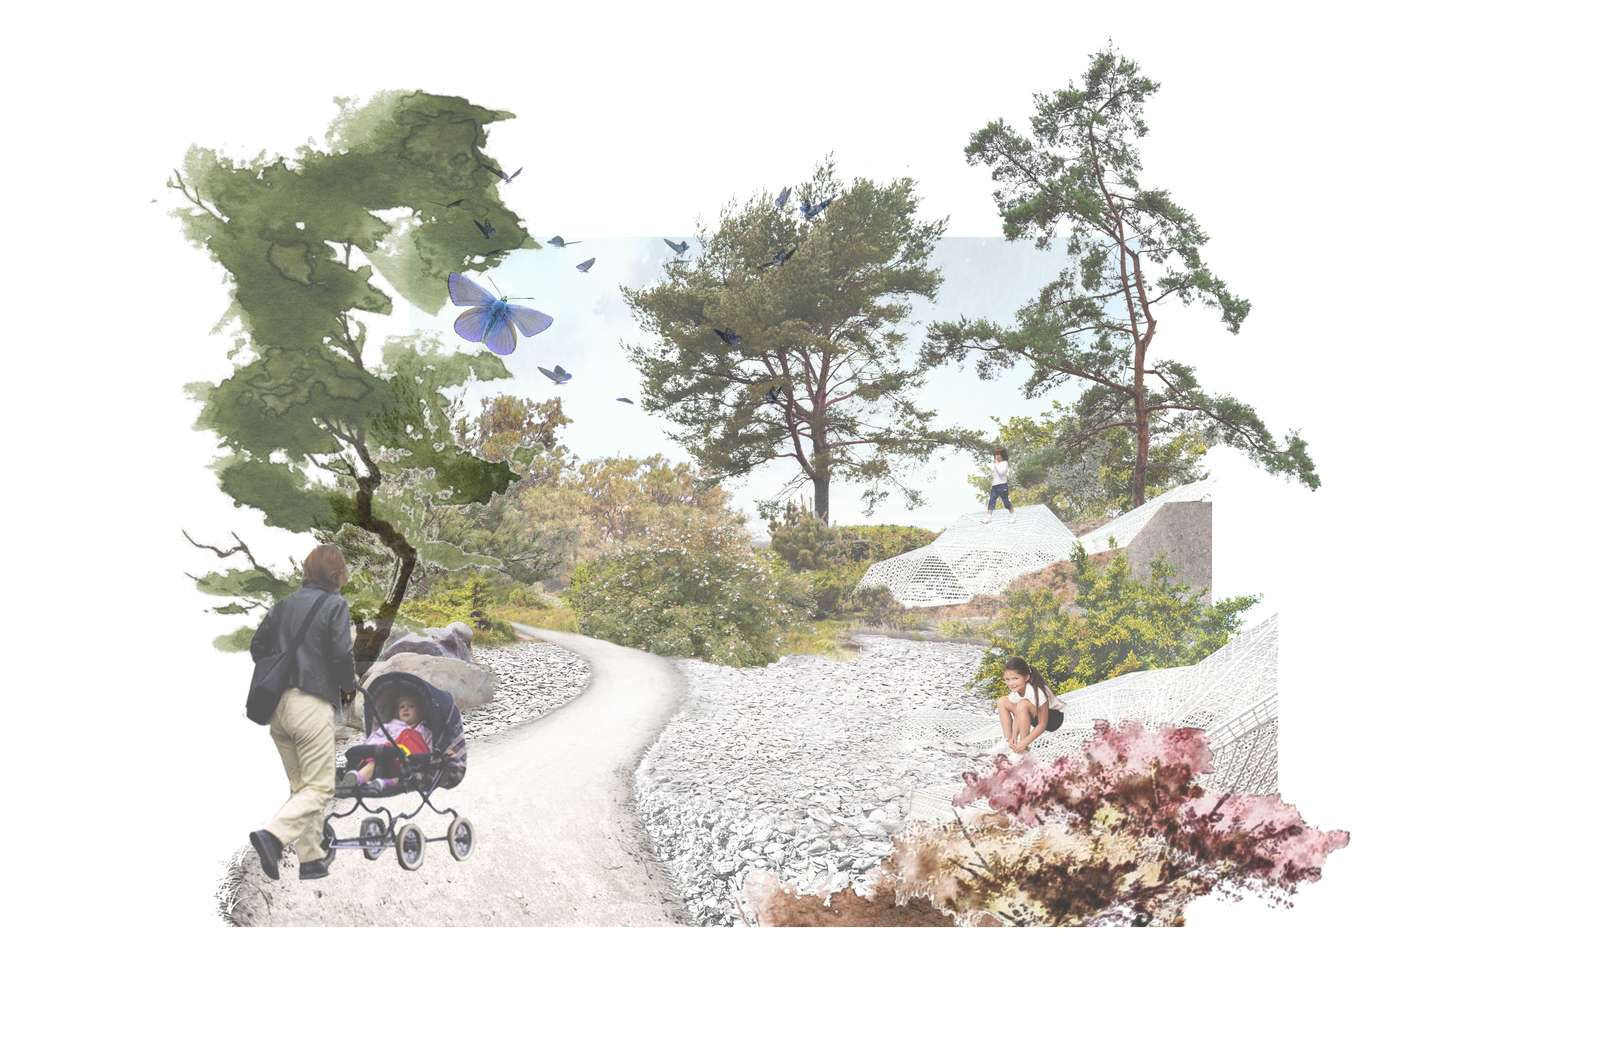 Nu bliver den nye naturpark i Kanalbyen anlagt